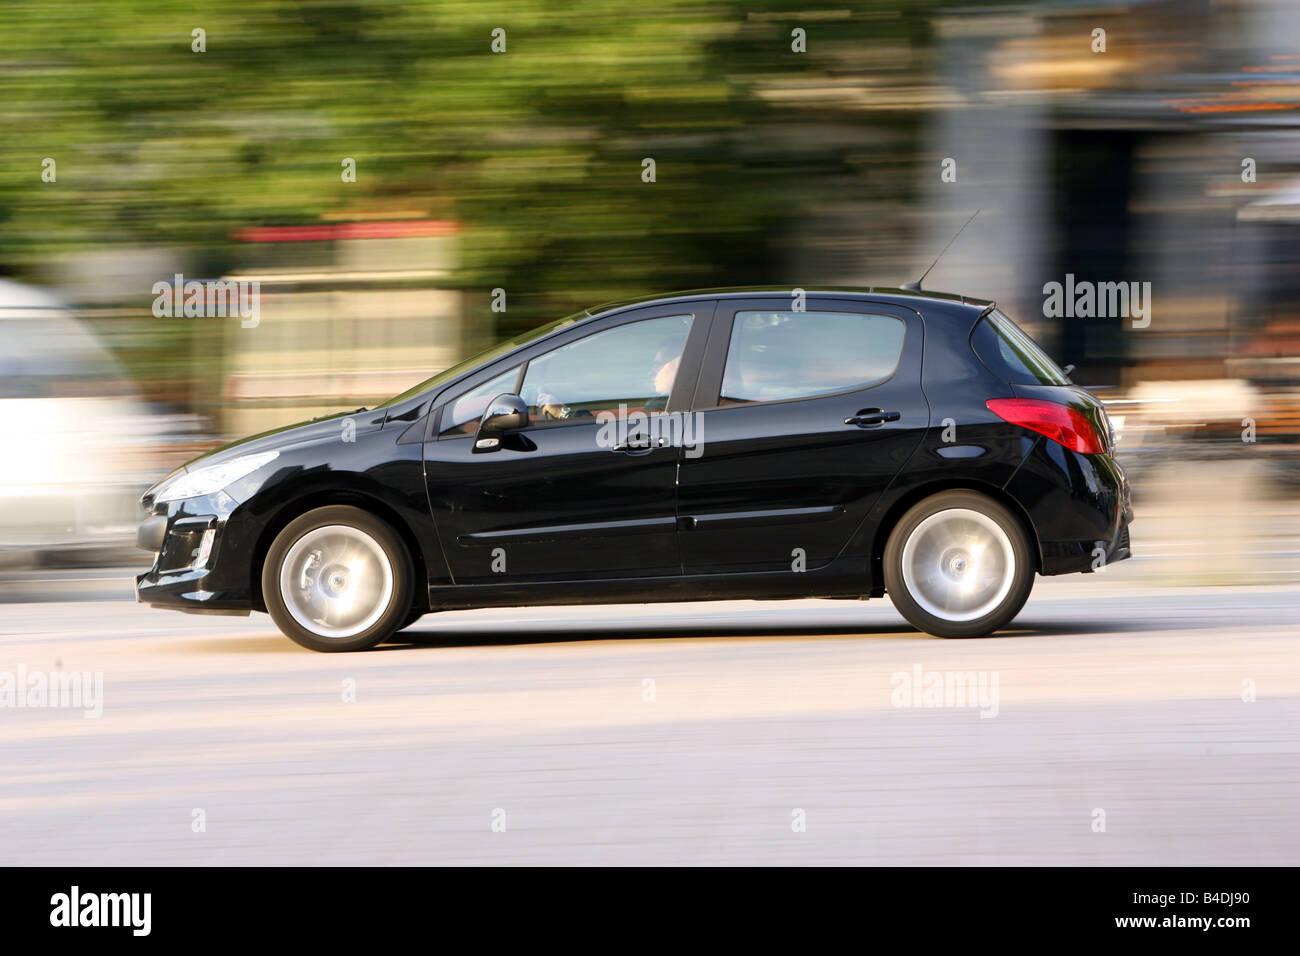 Peugeot 308 HDi FAP 135 Sport Plus, model year 2007-, black, driving, side view, City - Stock Image